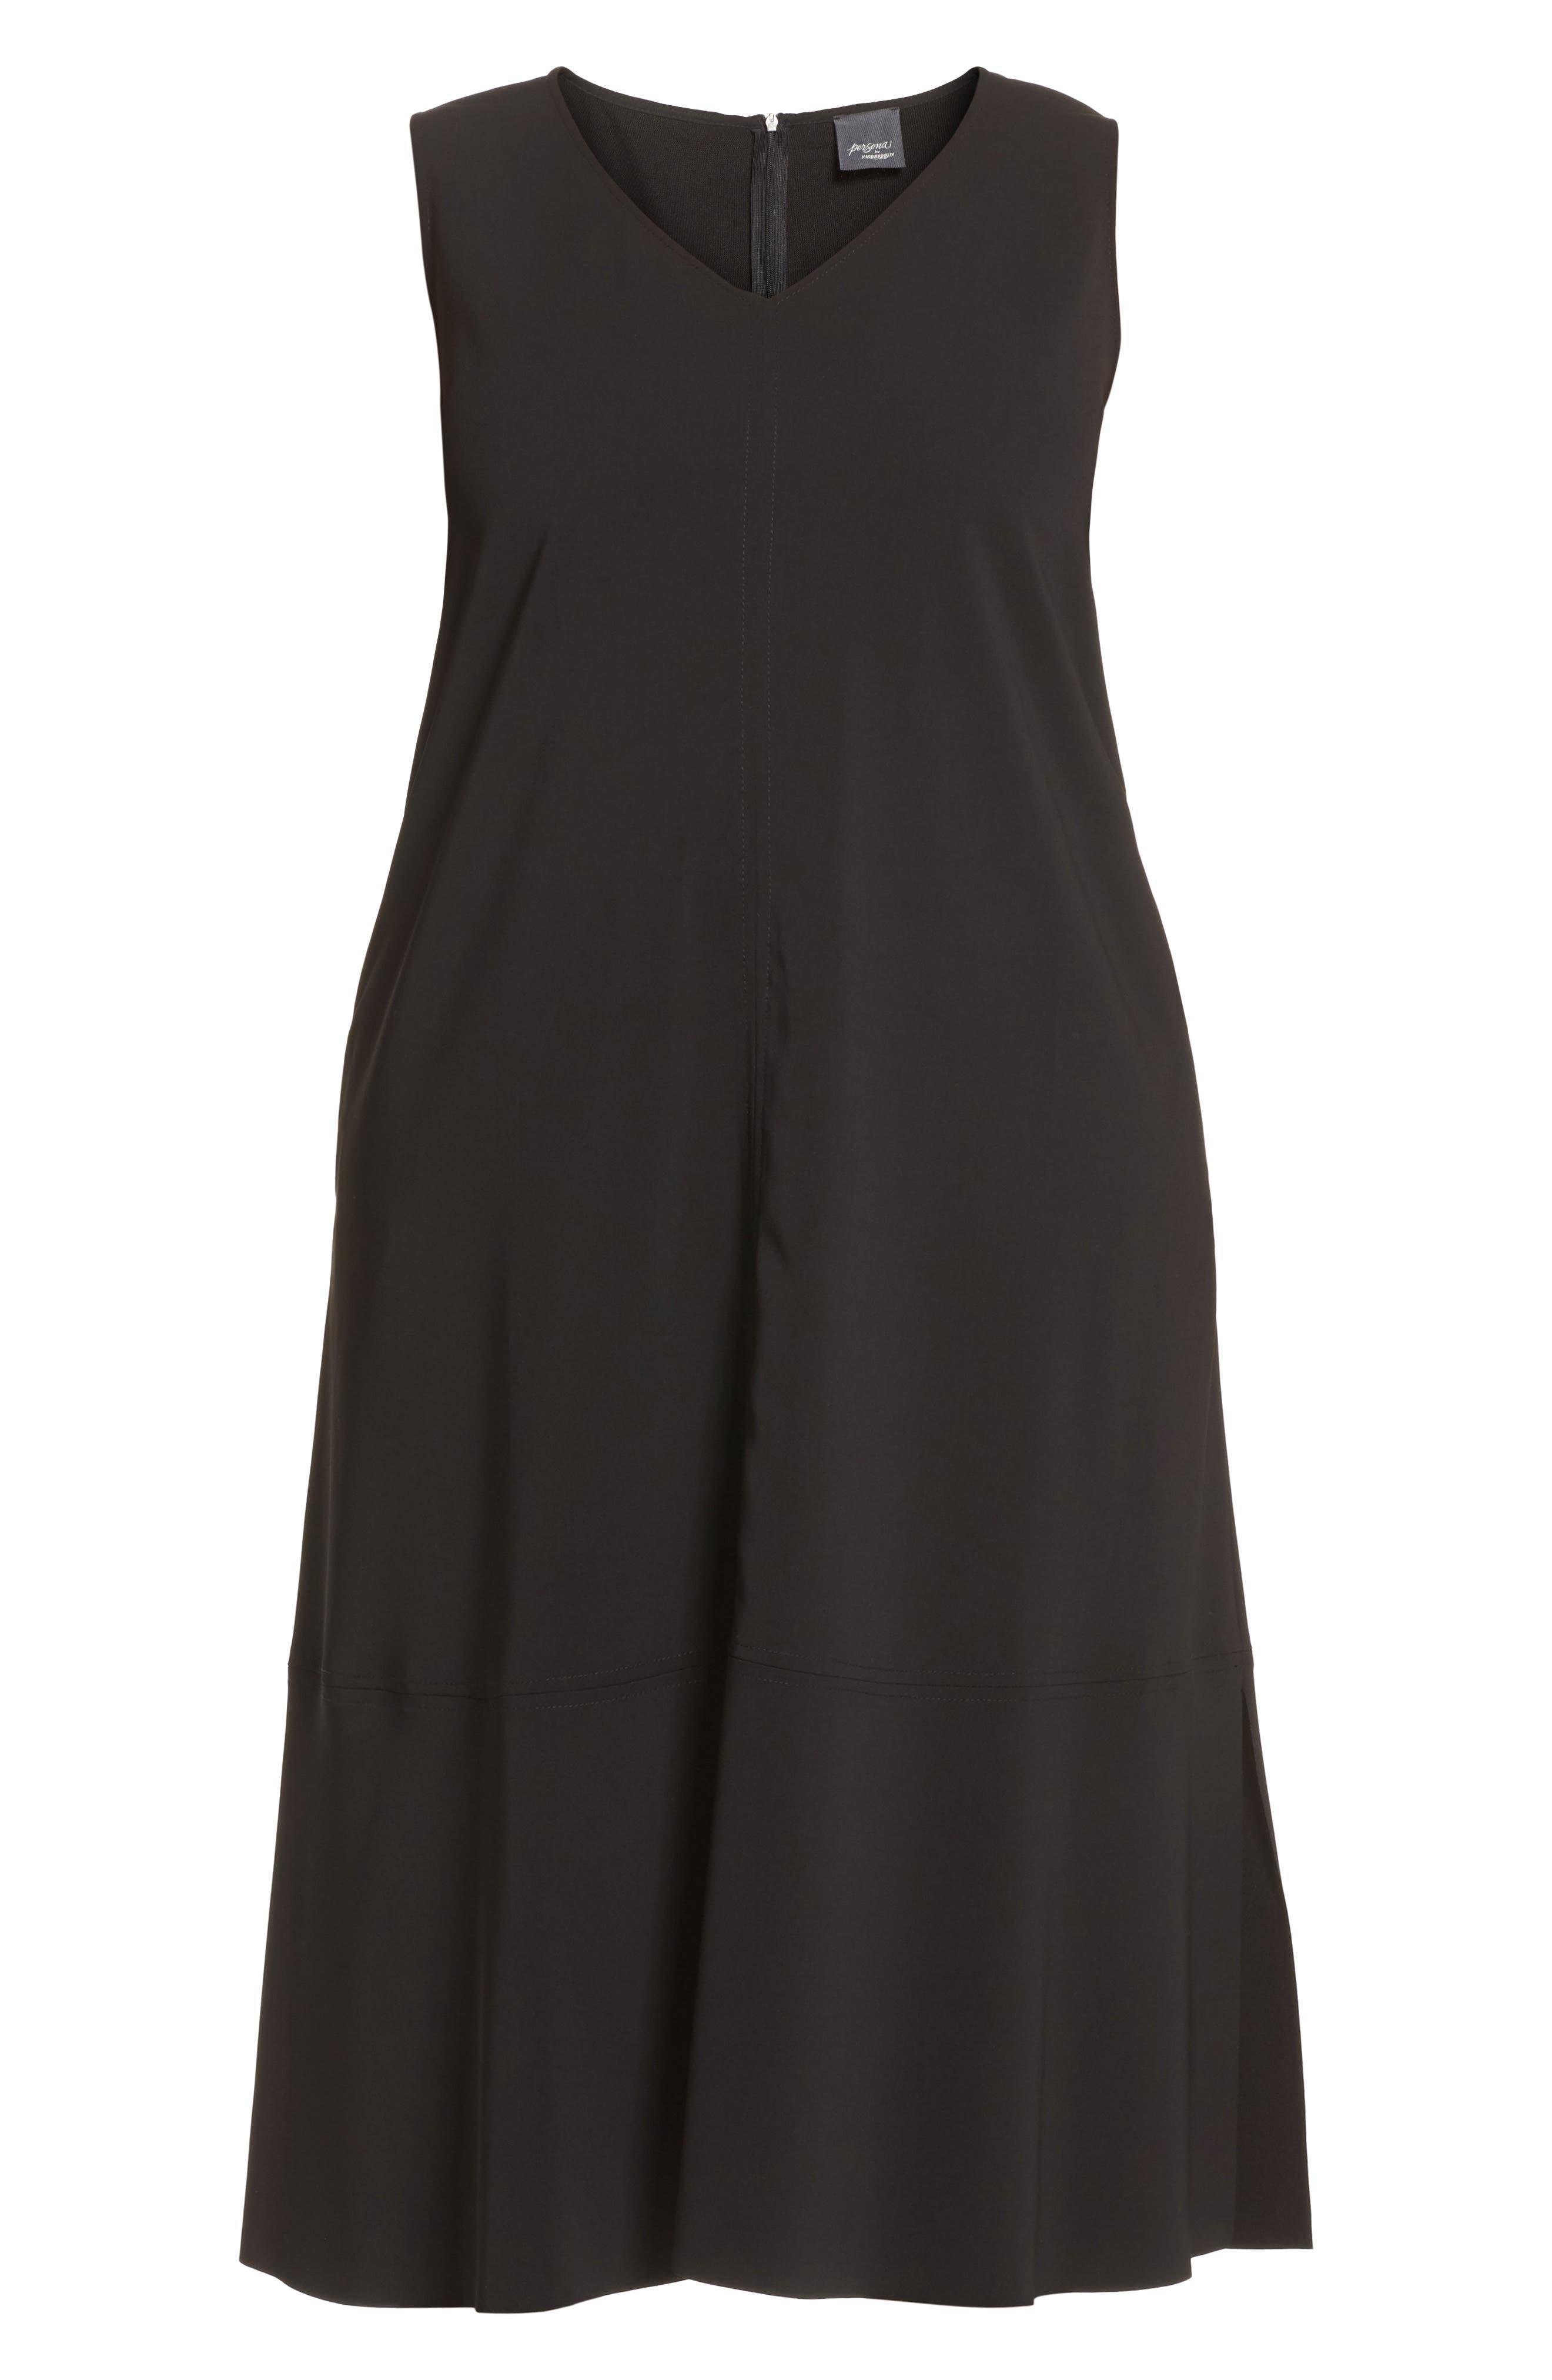 Slit Sleeve Knit Sheath Dress,                             Alternate thumbnail 6, color,                             010